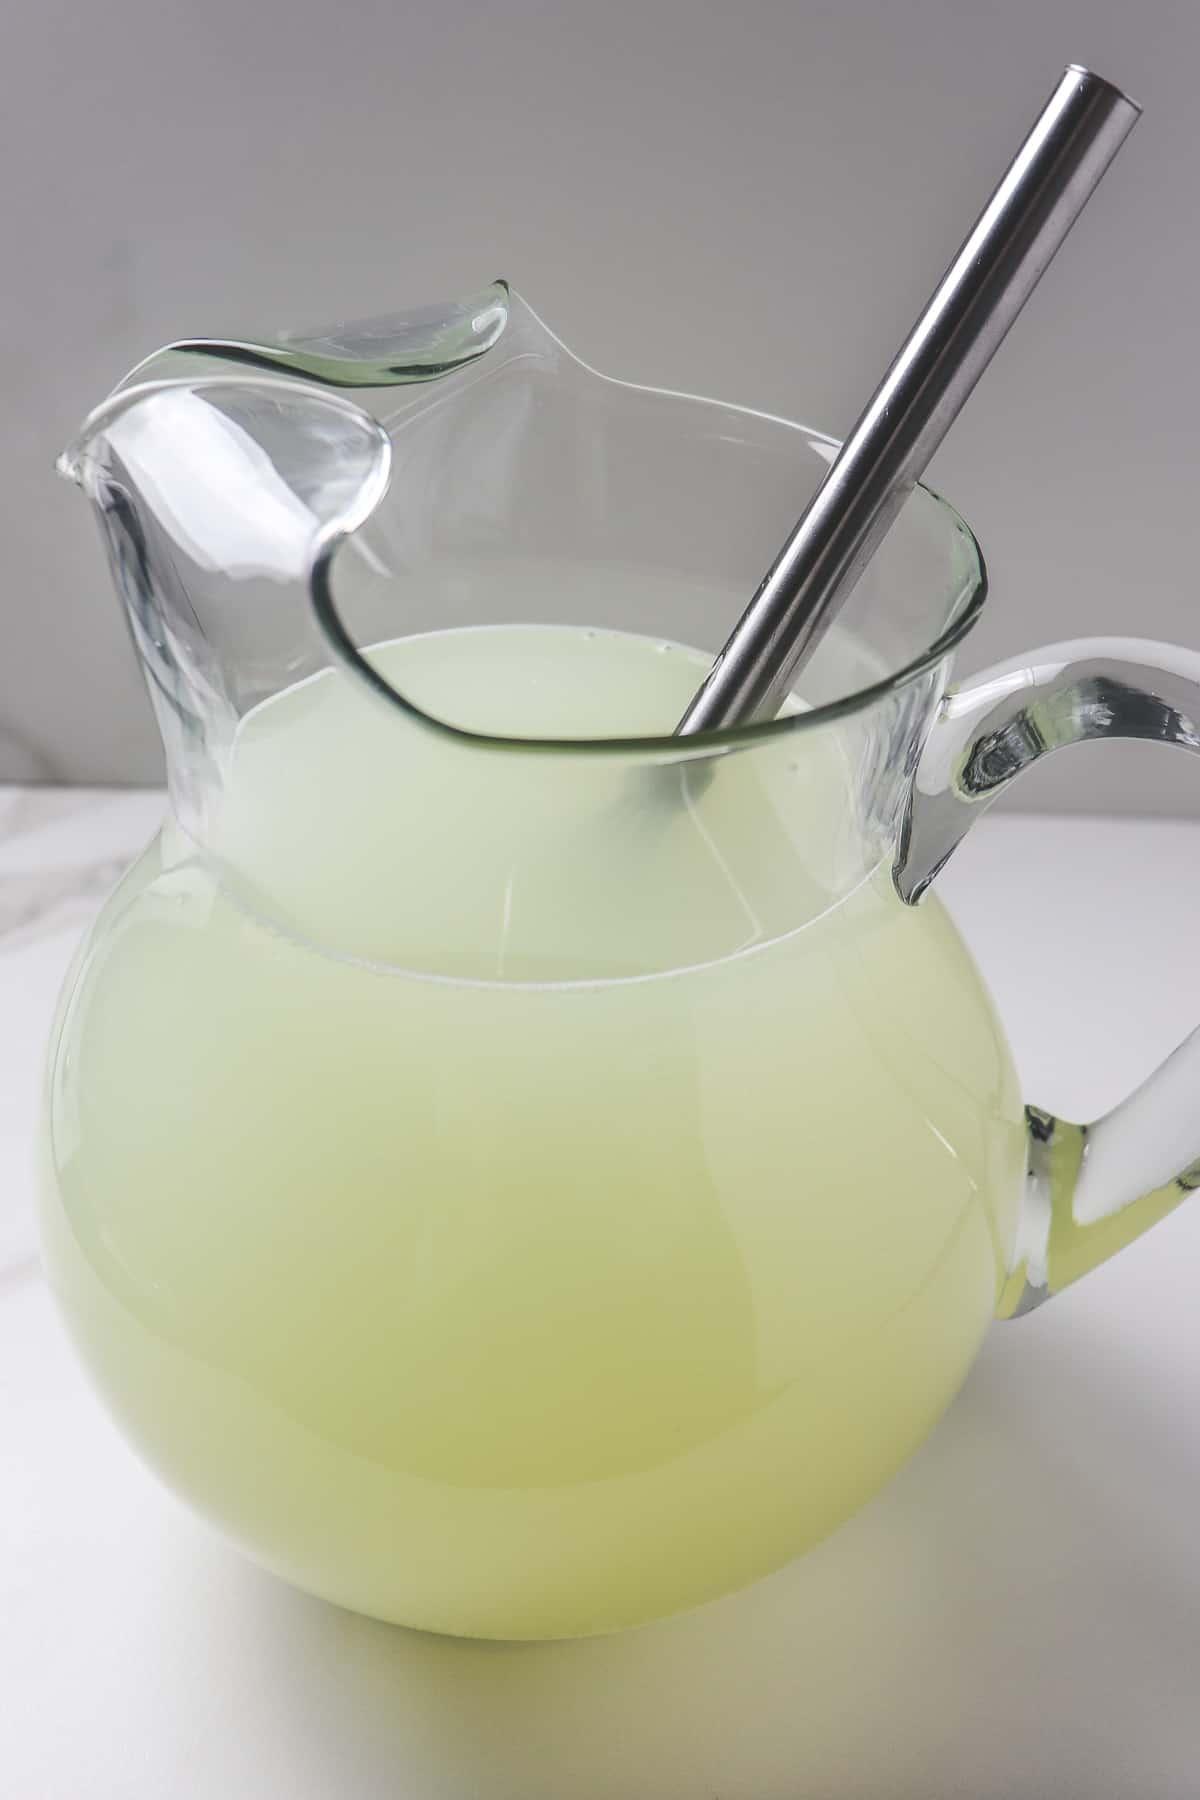 whisking stevia into lemonade mixture